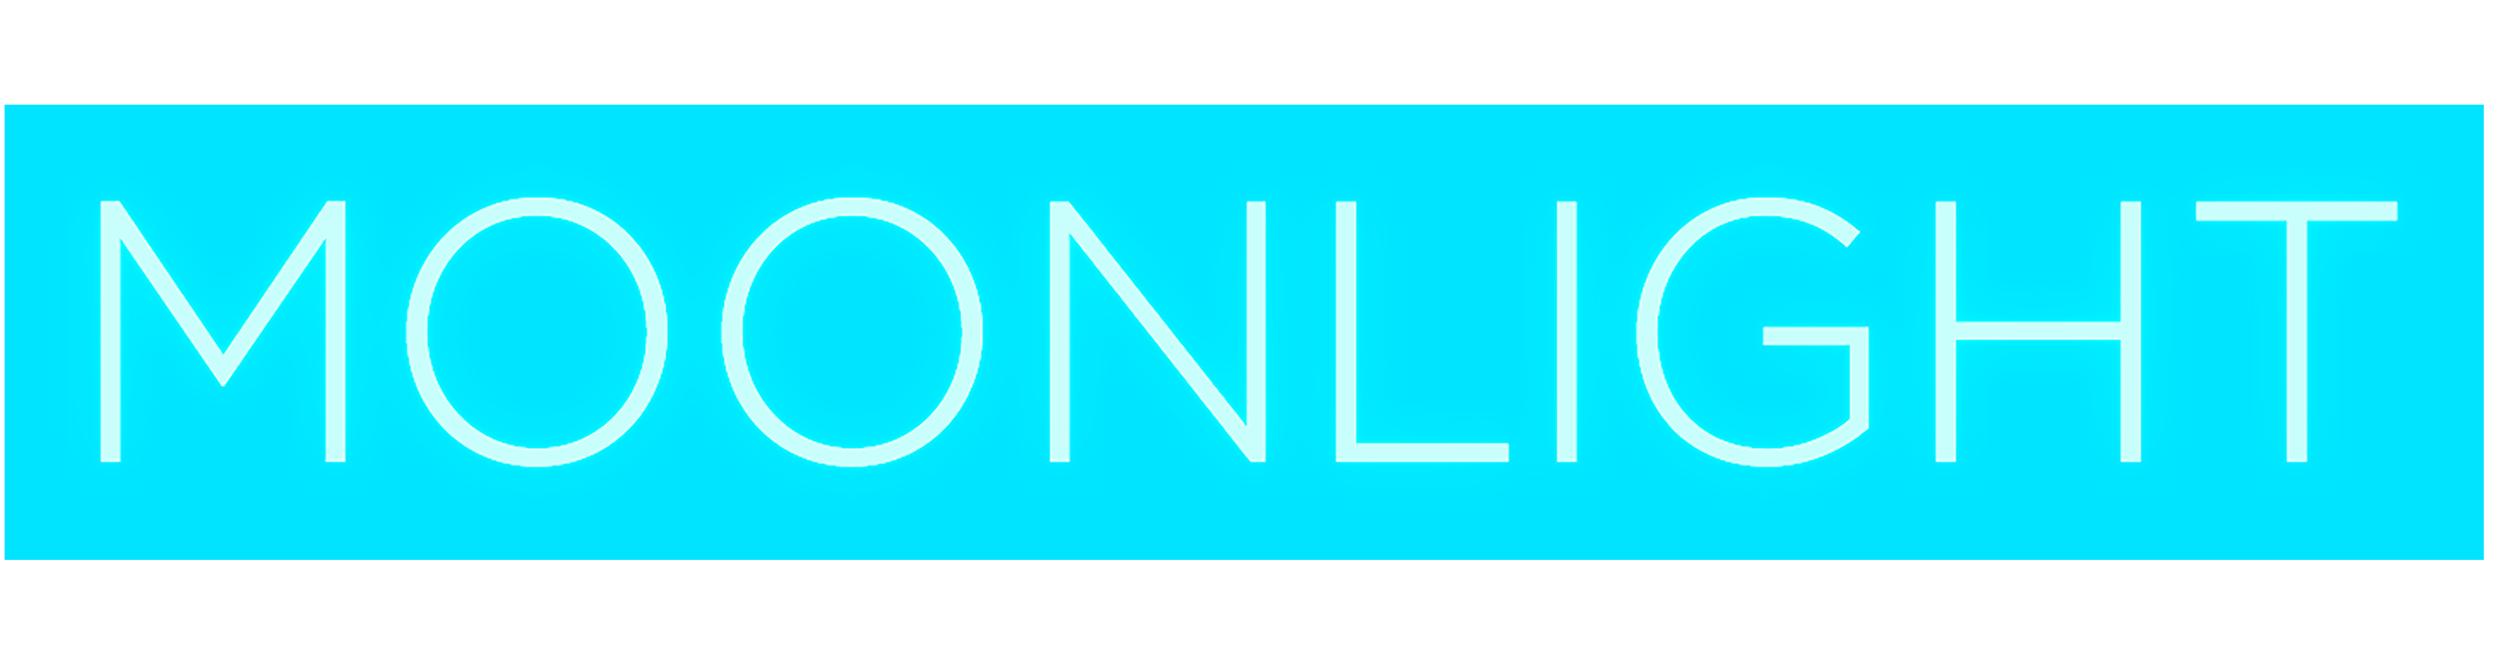 Moonlight_2016_Logo_web.png